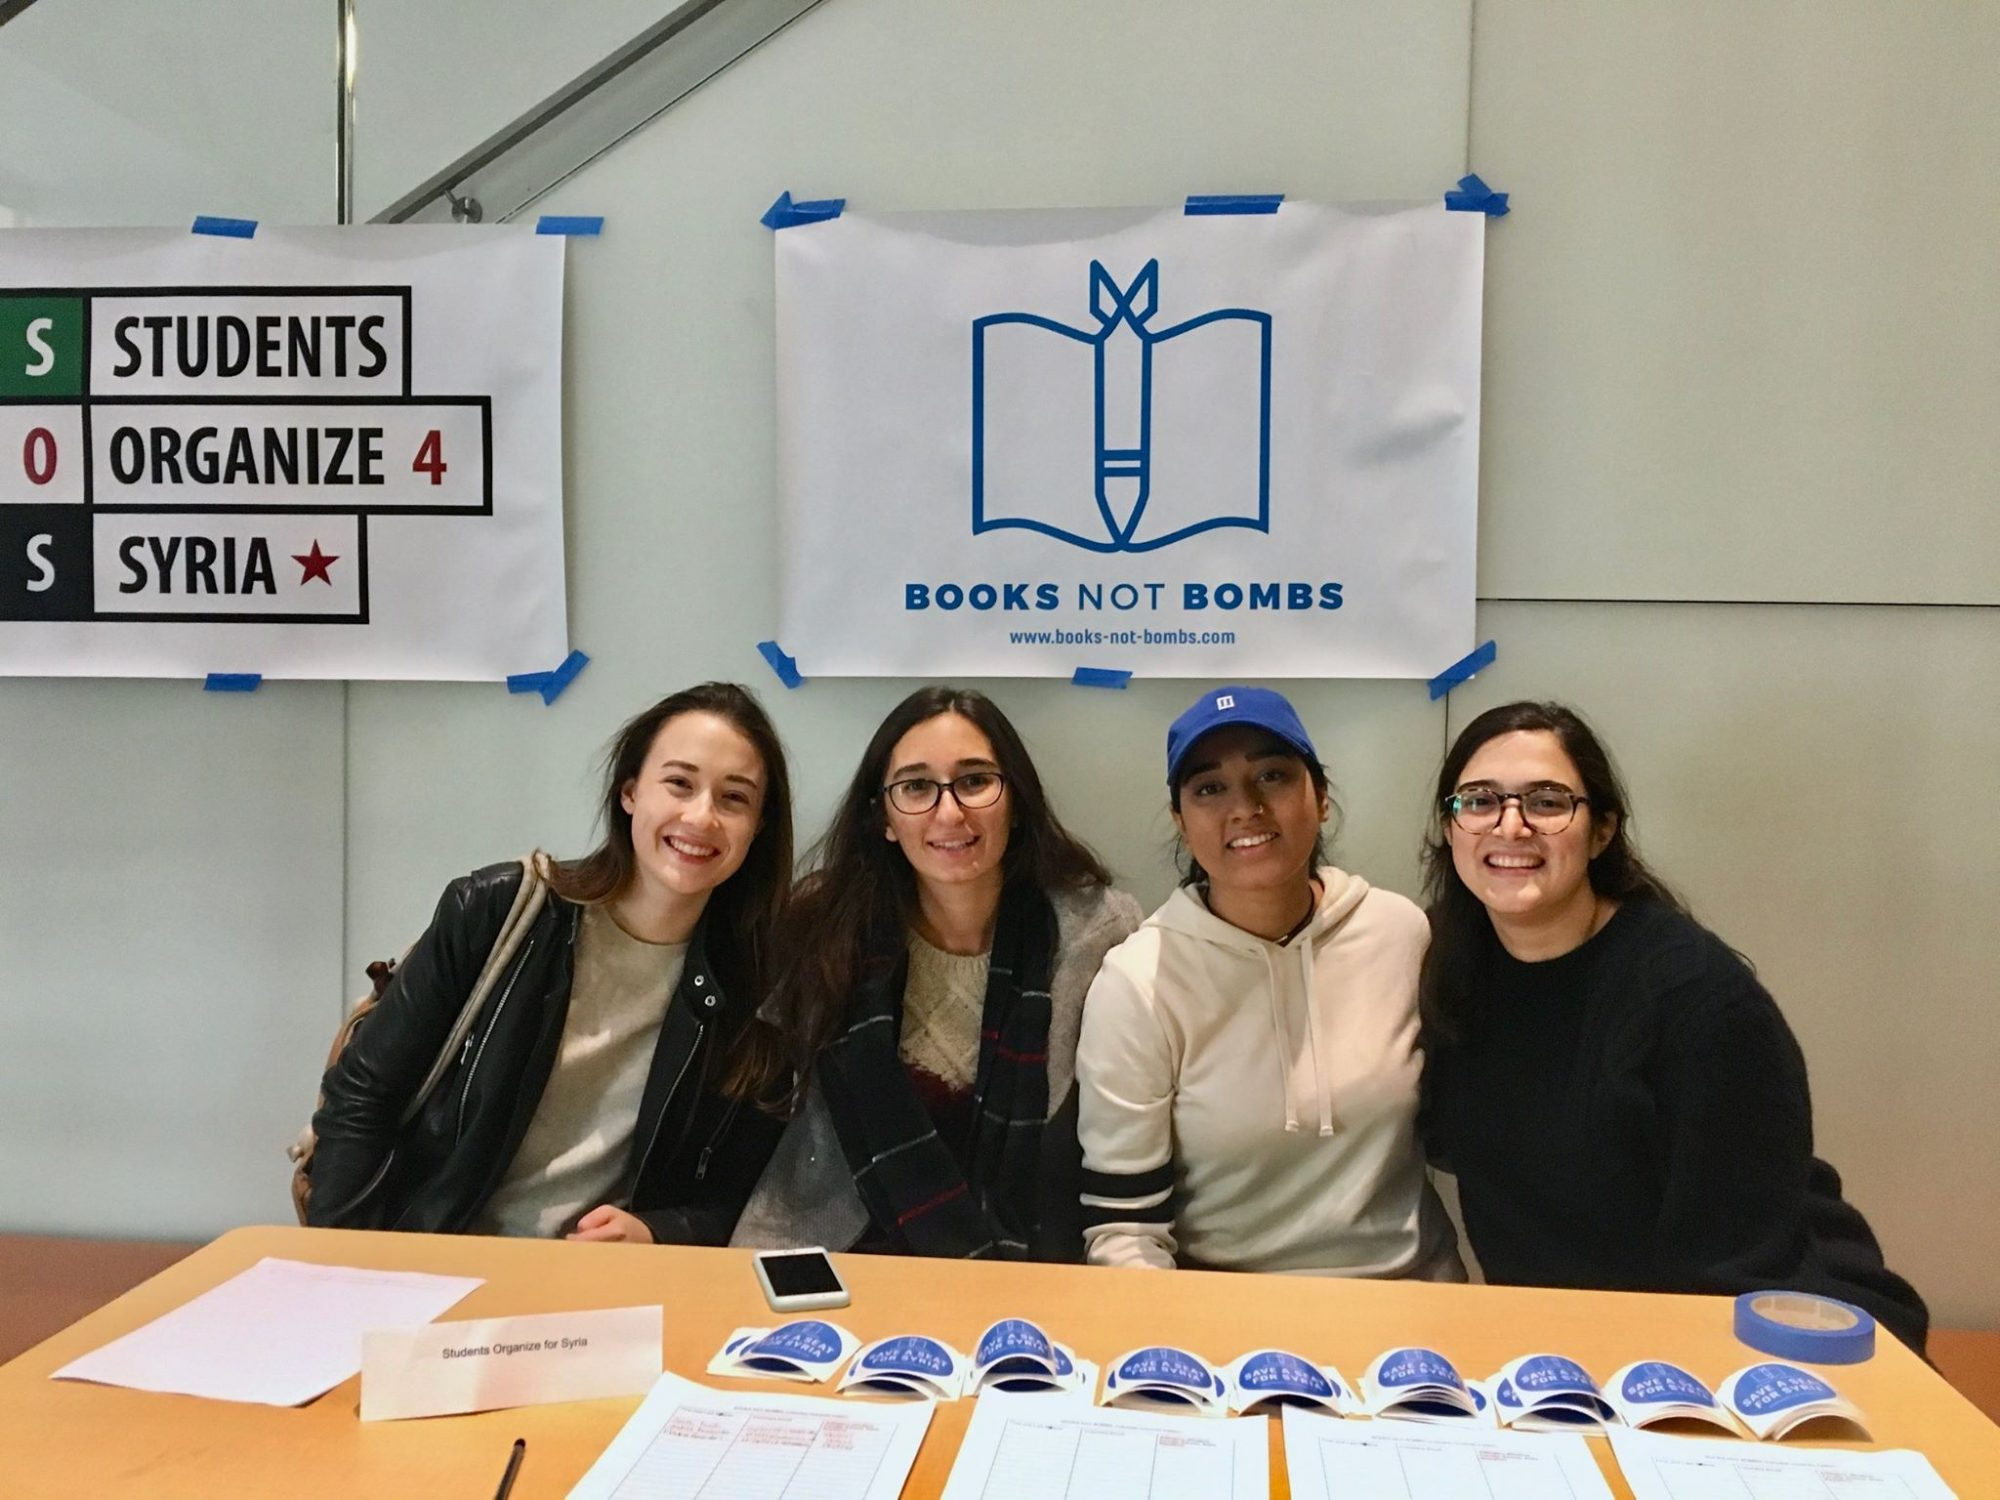 Barnard women organizers